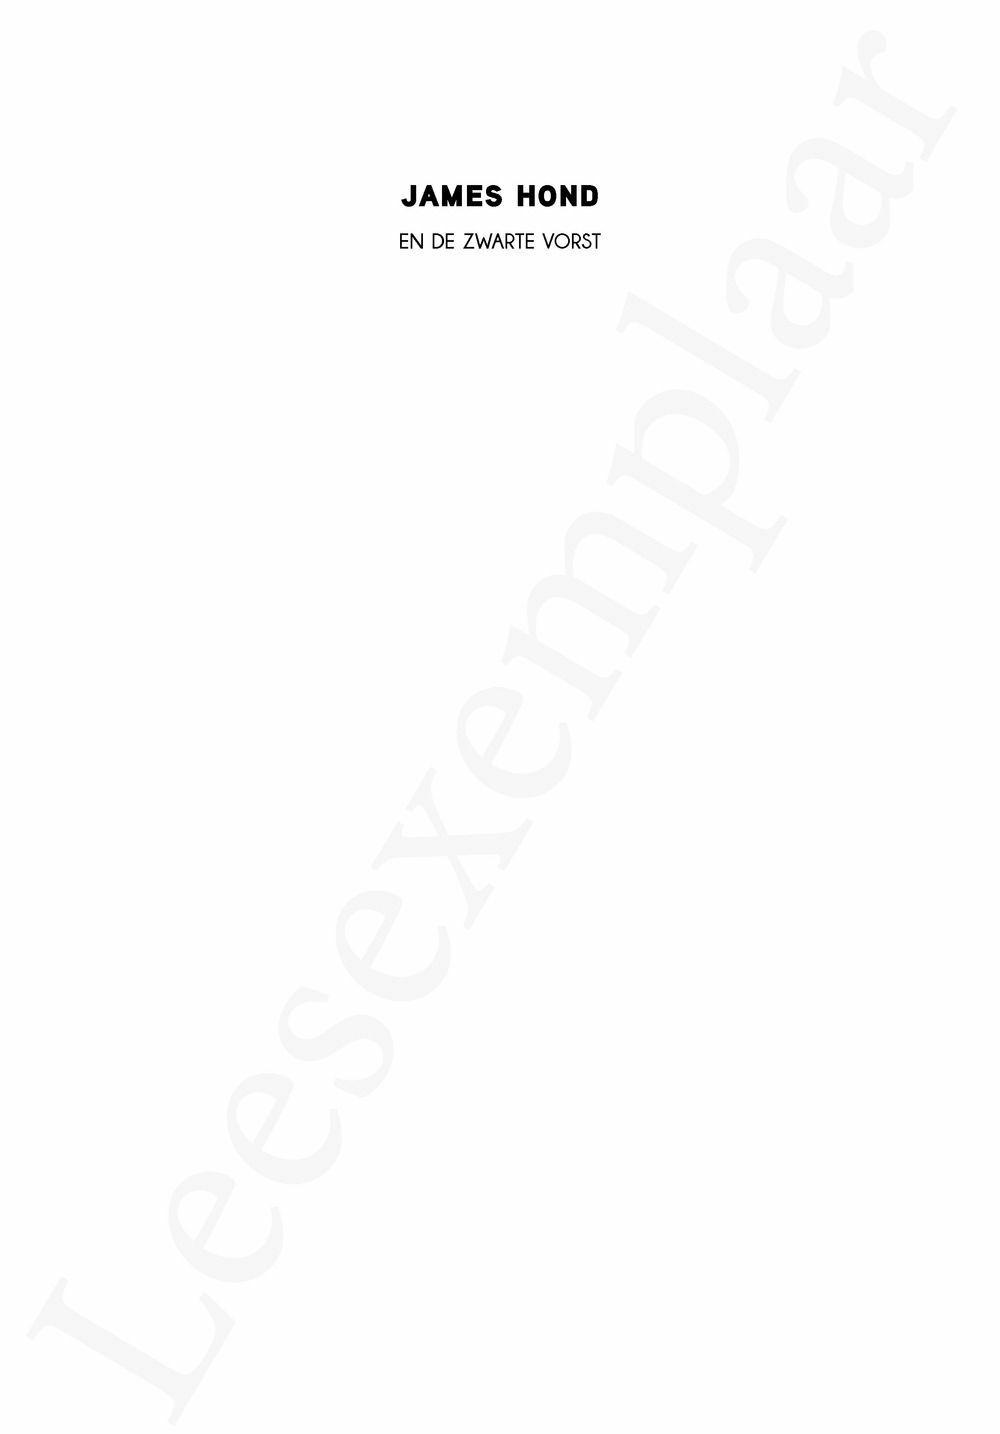 Preview: James Hond en de zwarte vorst